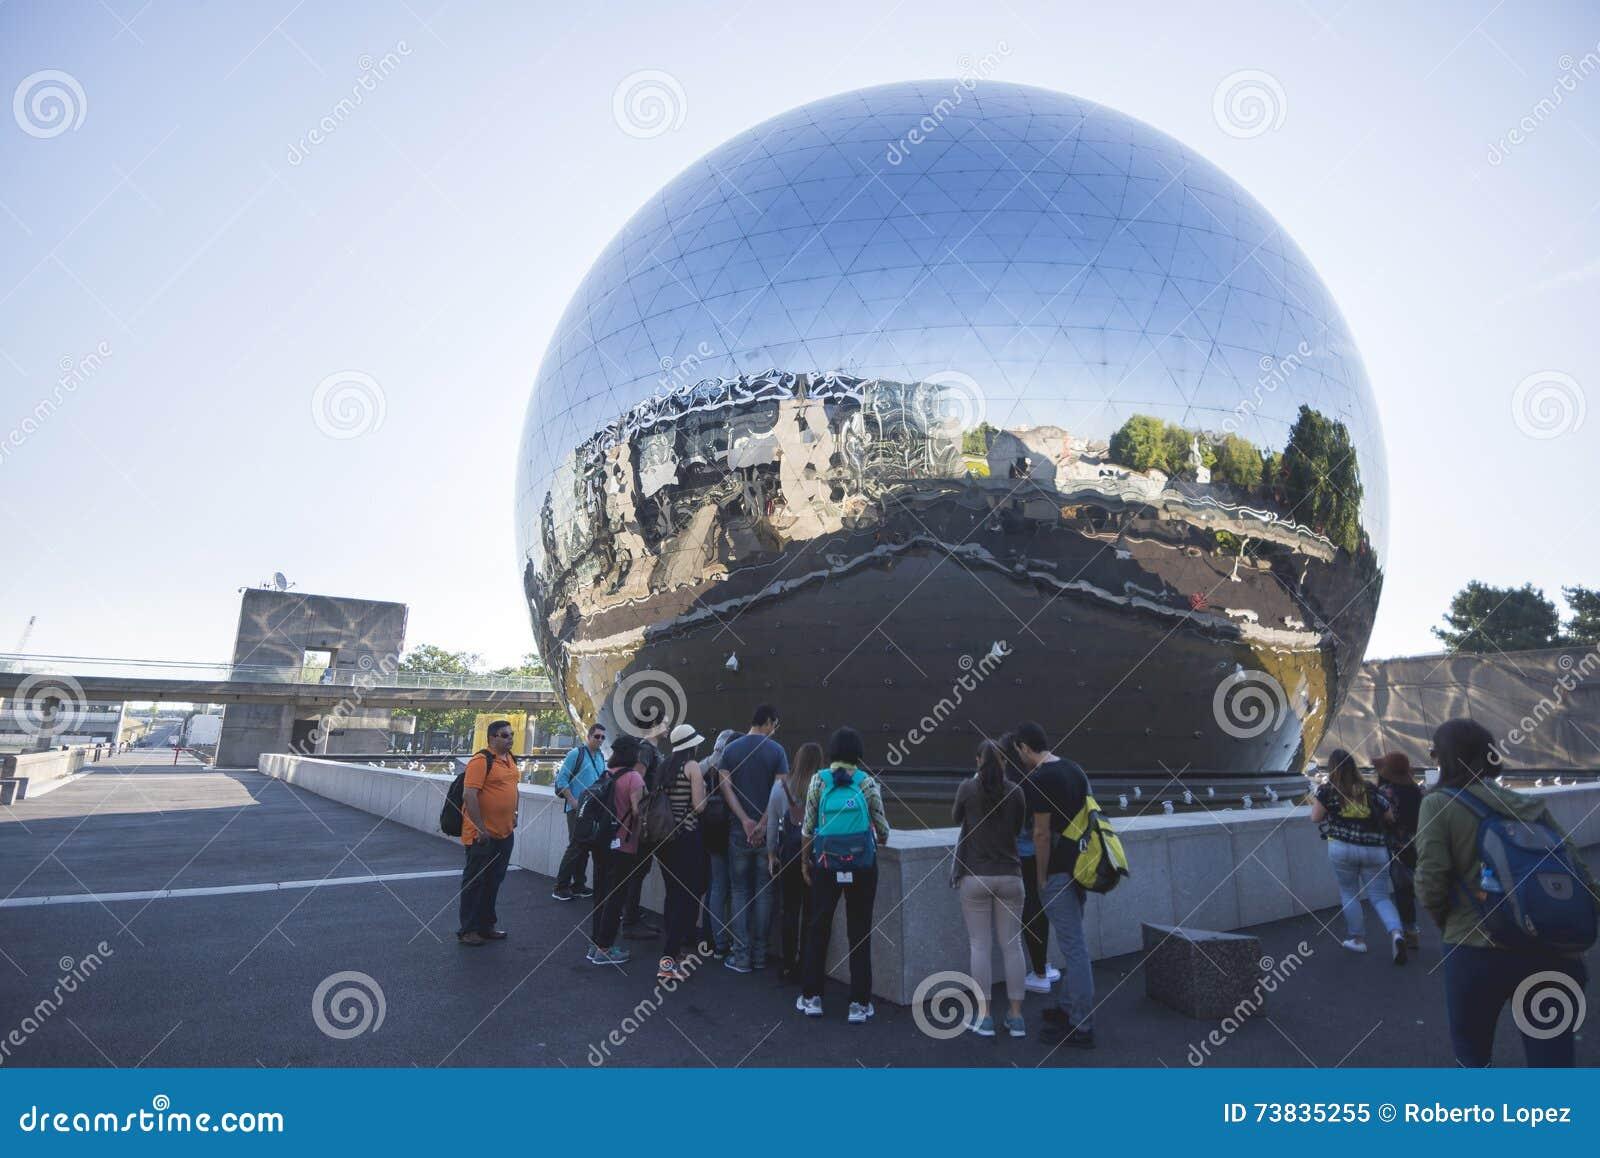 Glass Sphere on Park